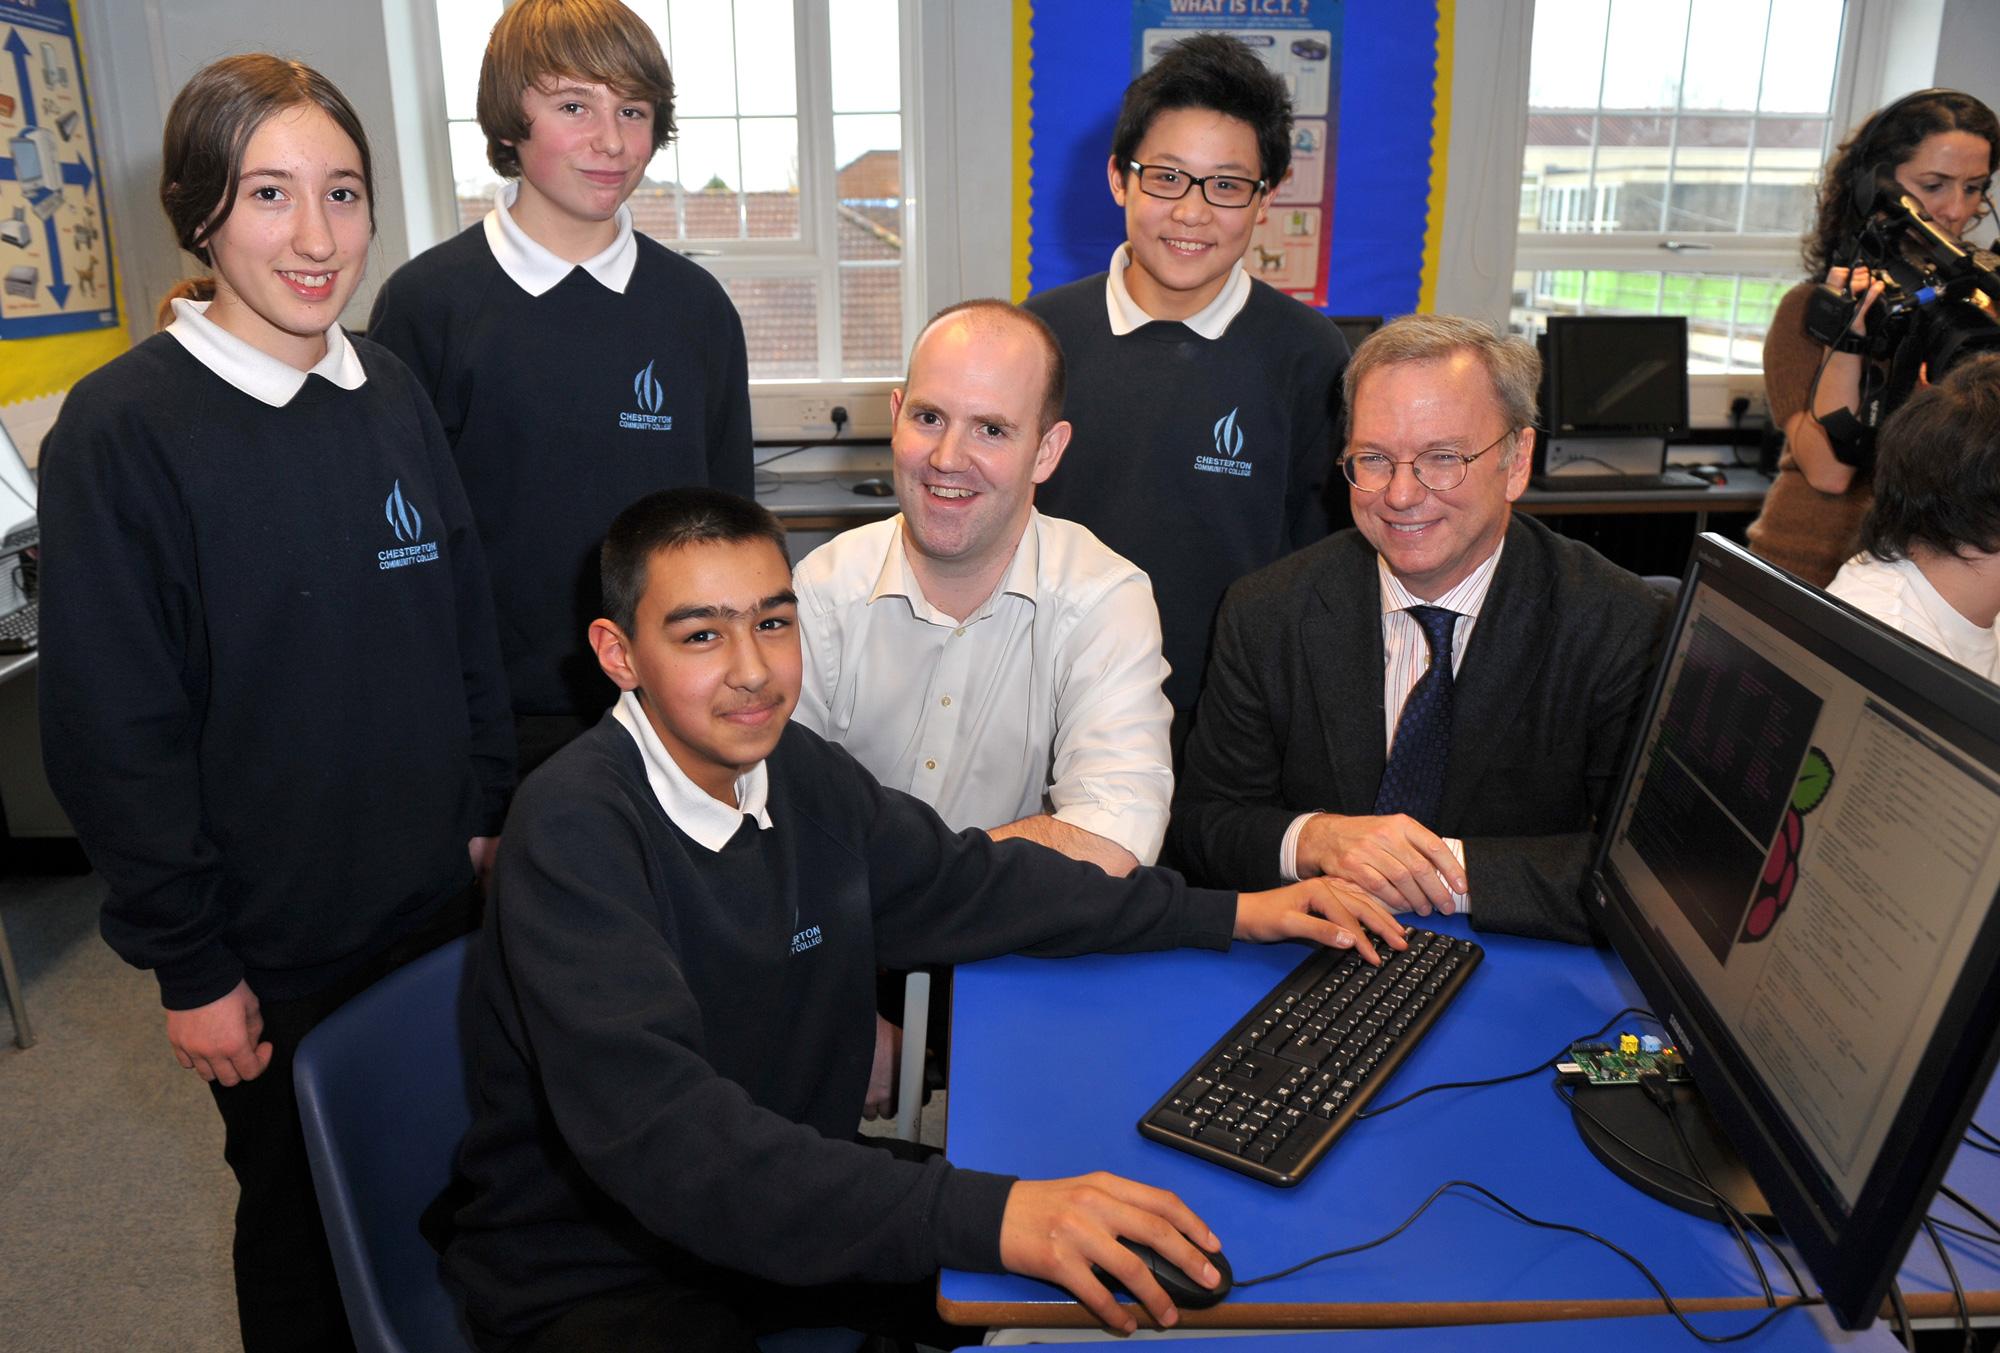 15,000 Raspberry Pis for UK schools - thanks Google! - Raspberry Pi